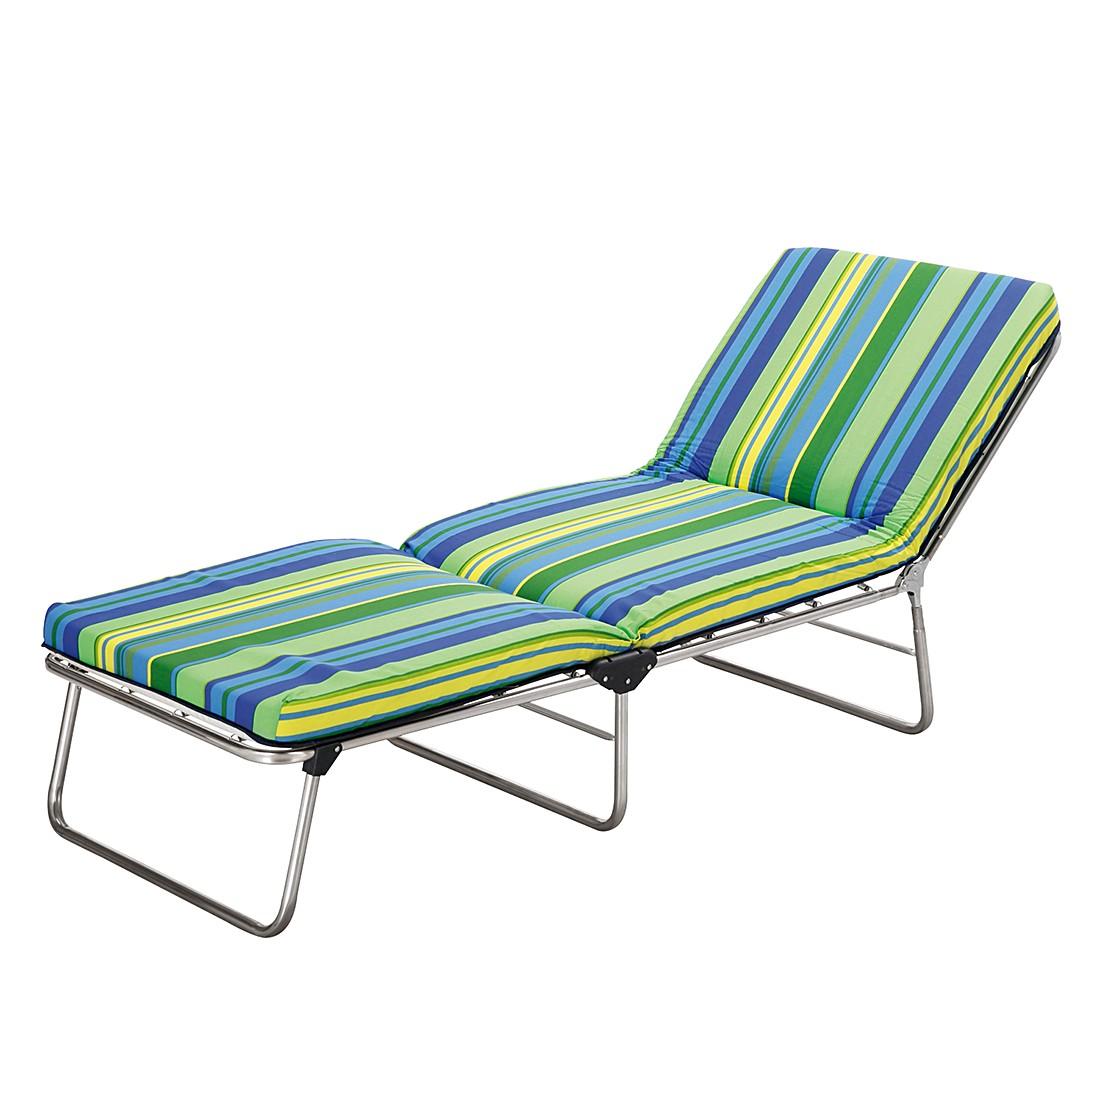 ultranatura chaise longue nizza en aluminium avec prix. Black Bedroom Furniture Sets. Home Design Ideas